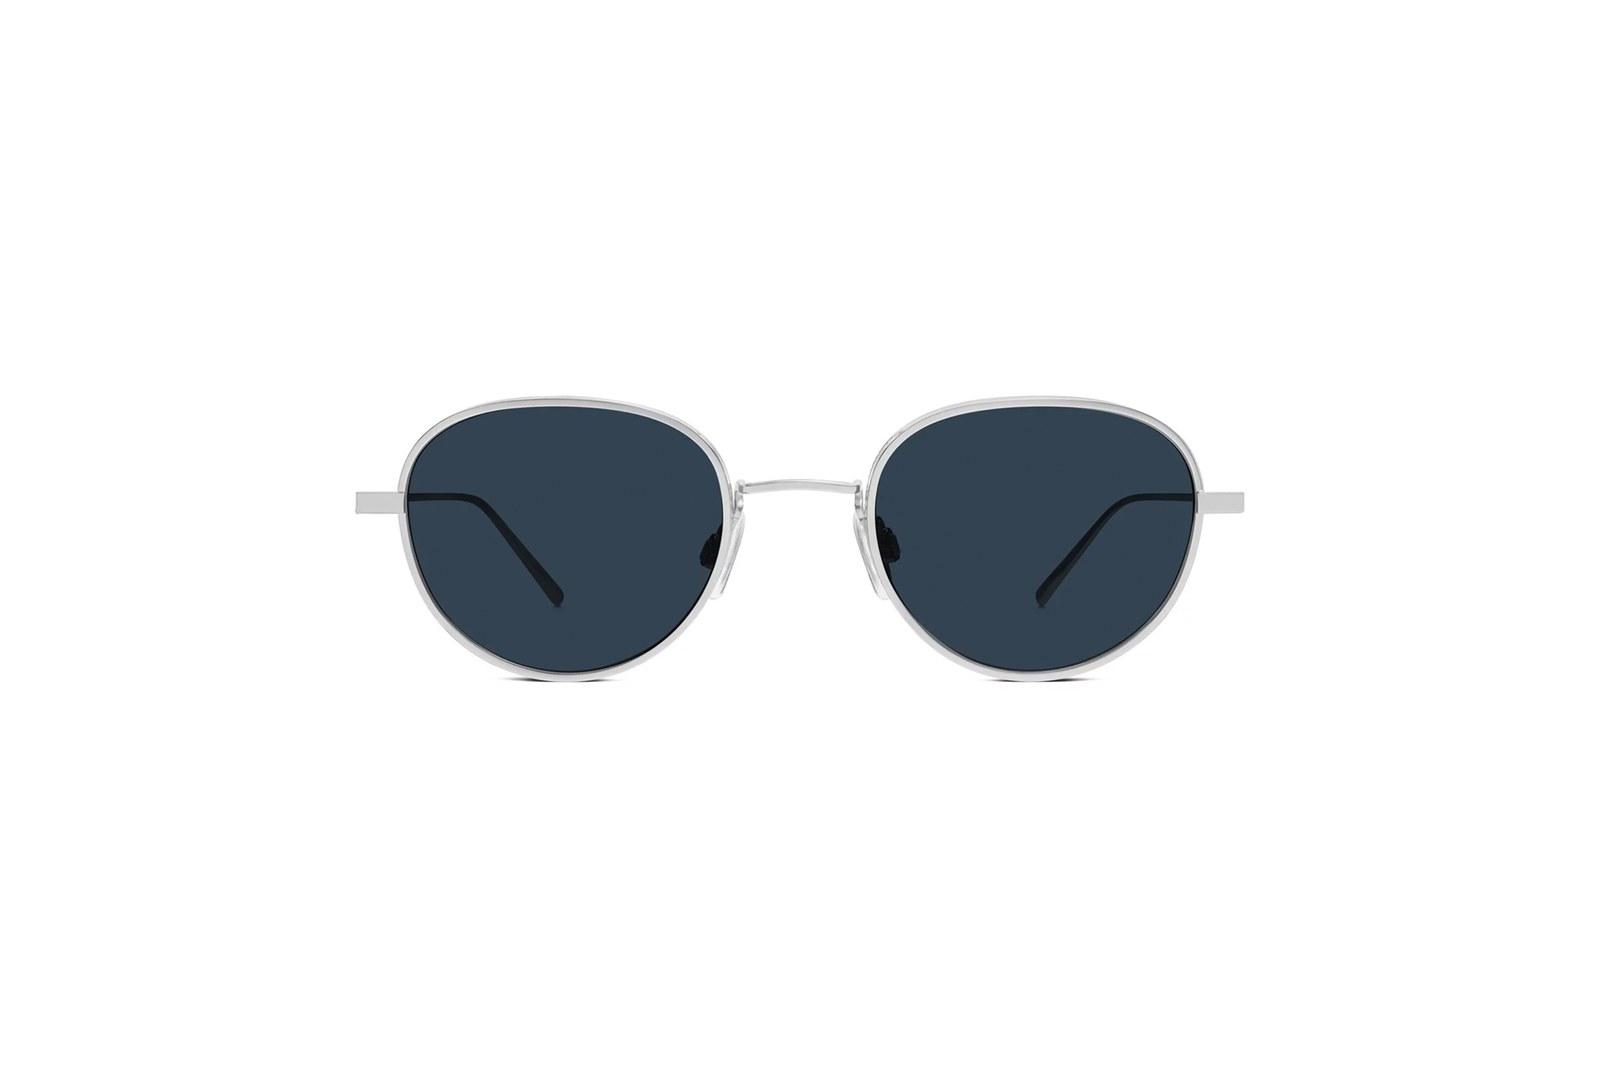 Kính Warby Parker Mercer sunglasses